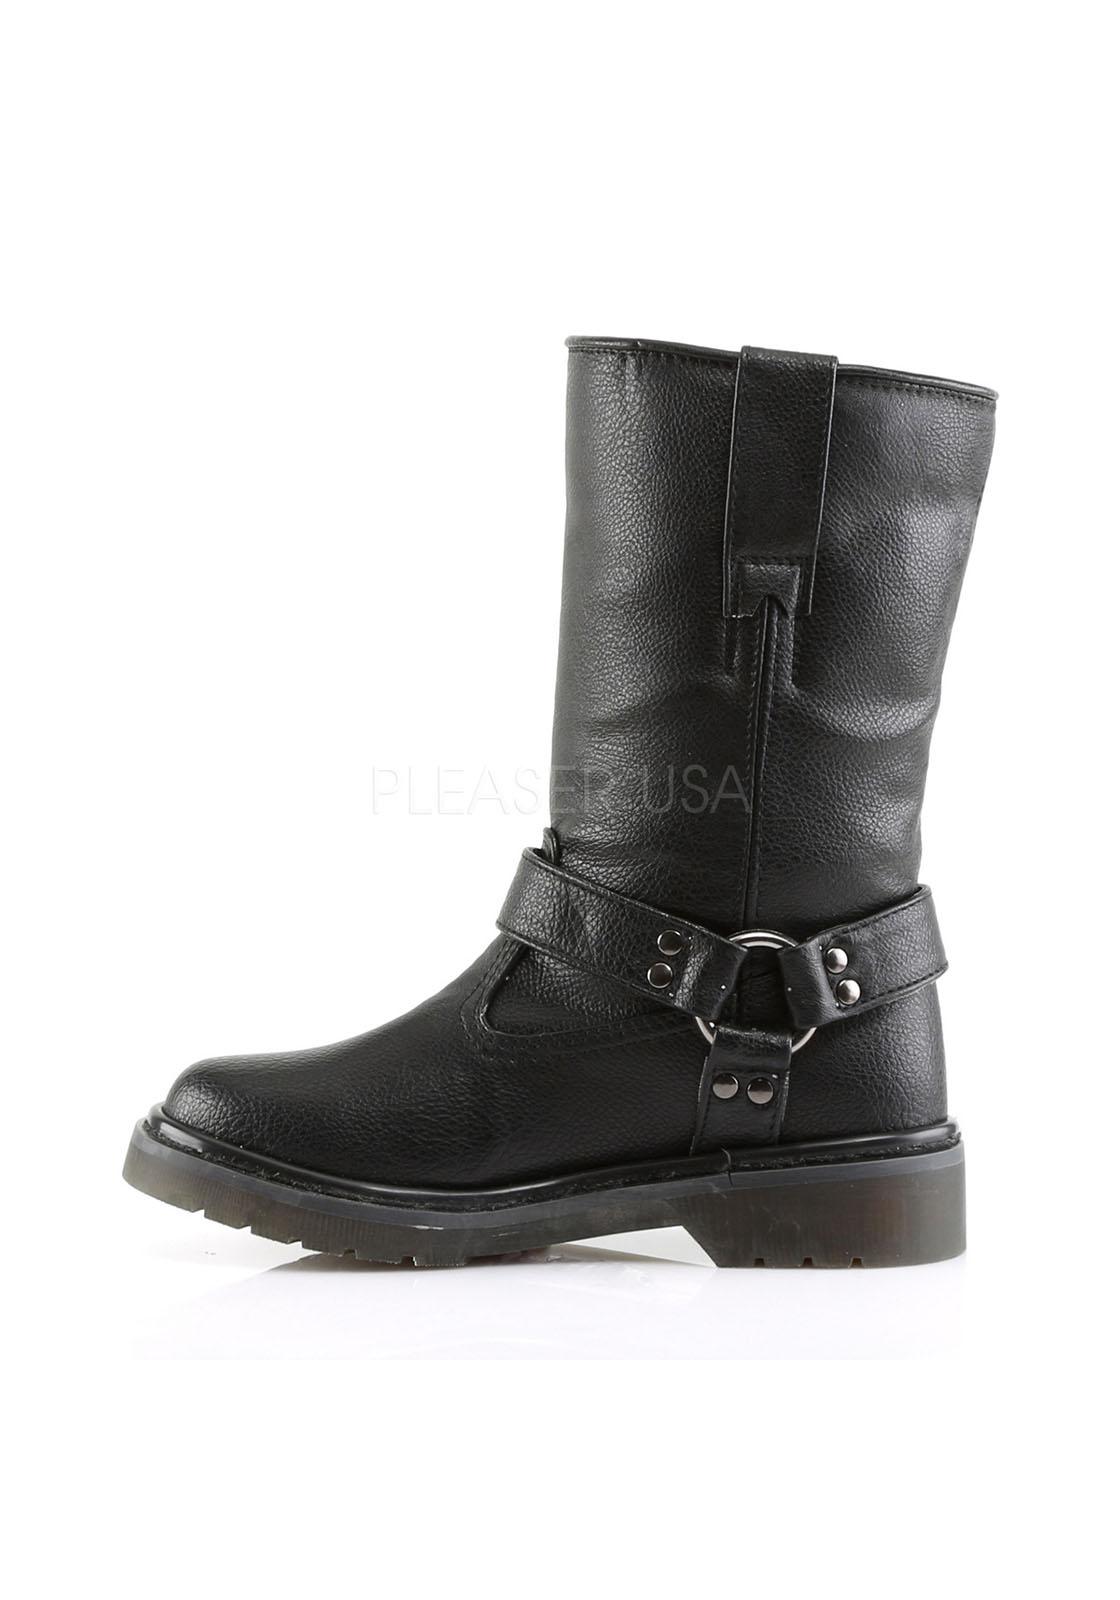 Demonia Rival 303 Boot (Women's) 0Gp9kn9d